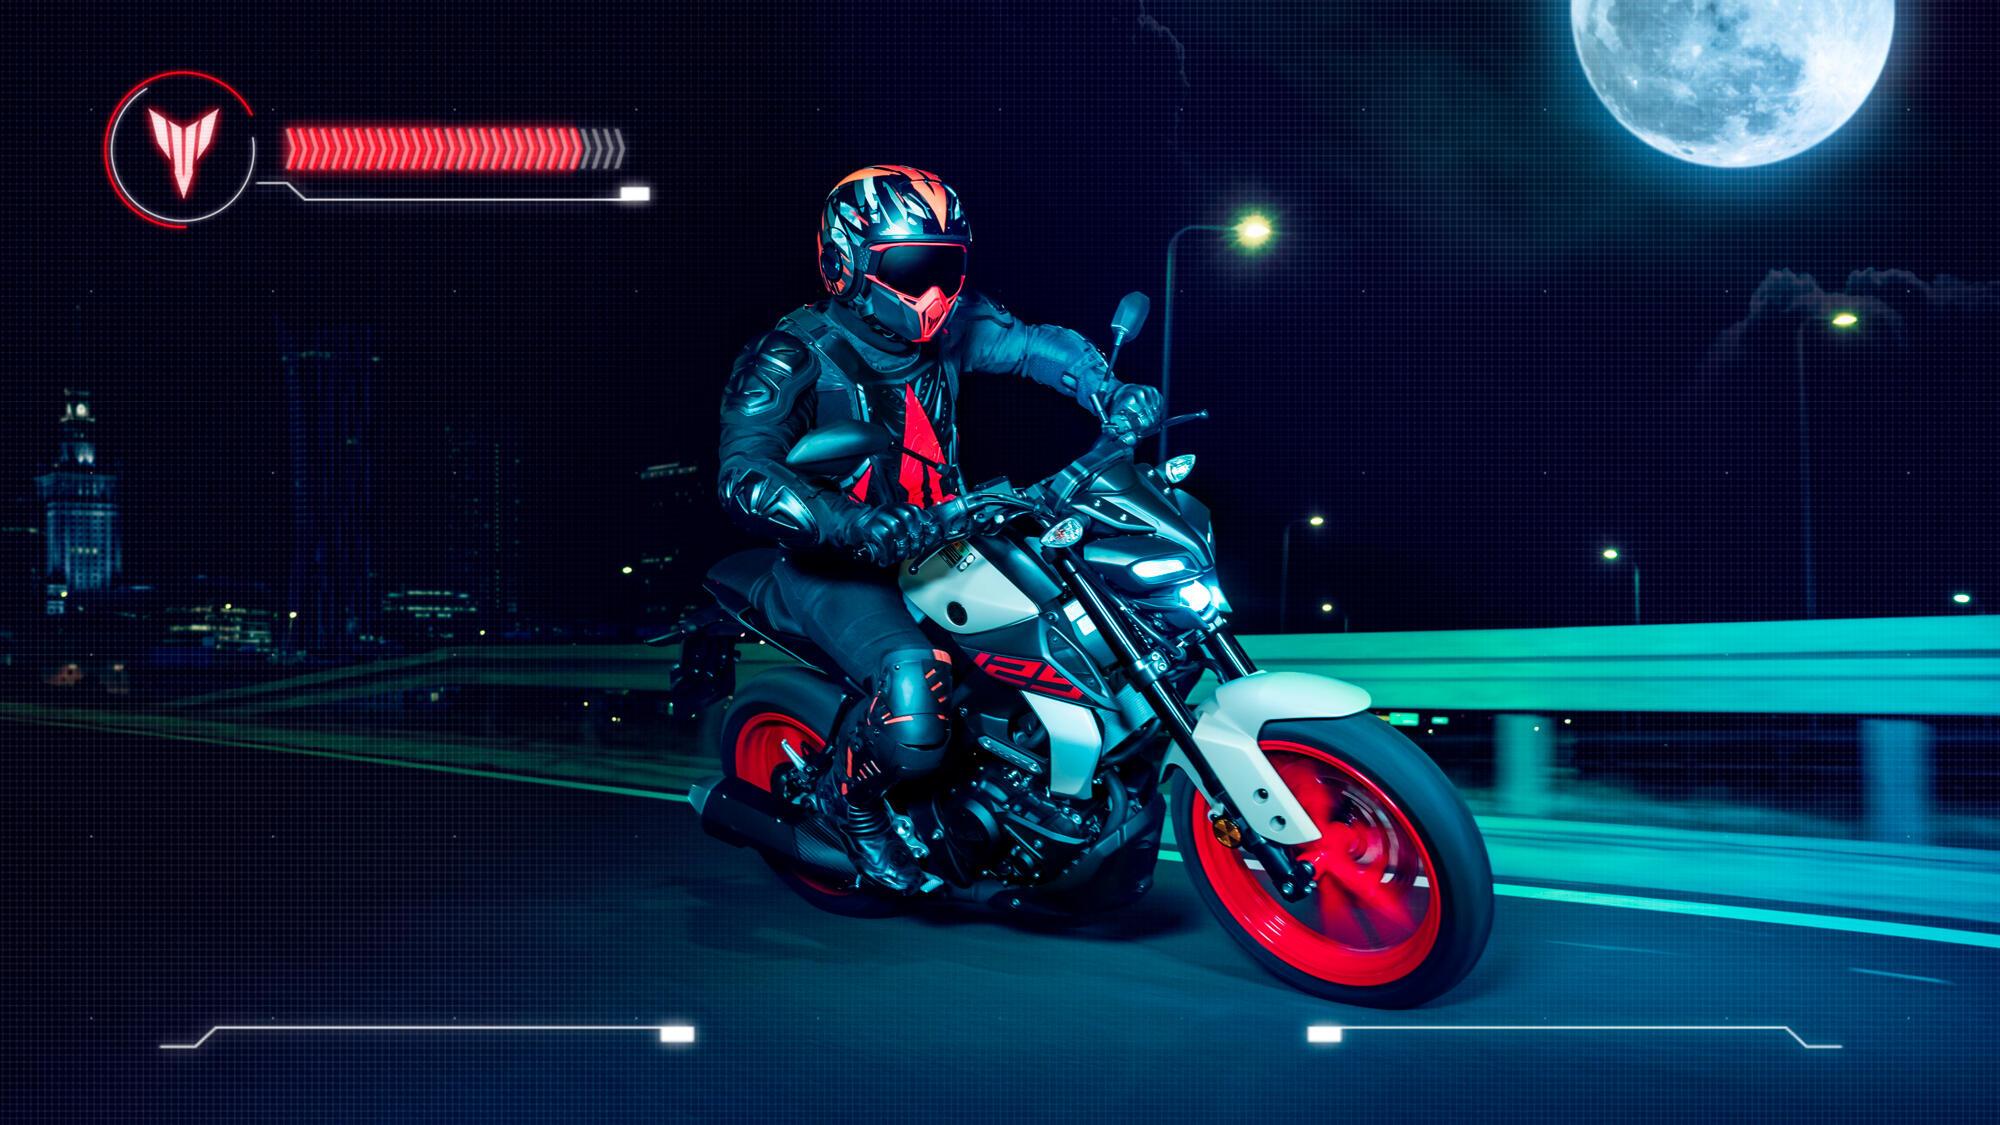 Yamaha MT-125 | MotorCentrumWest